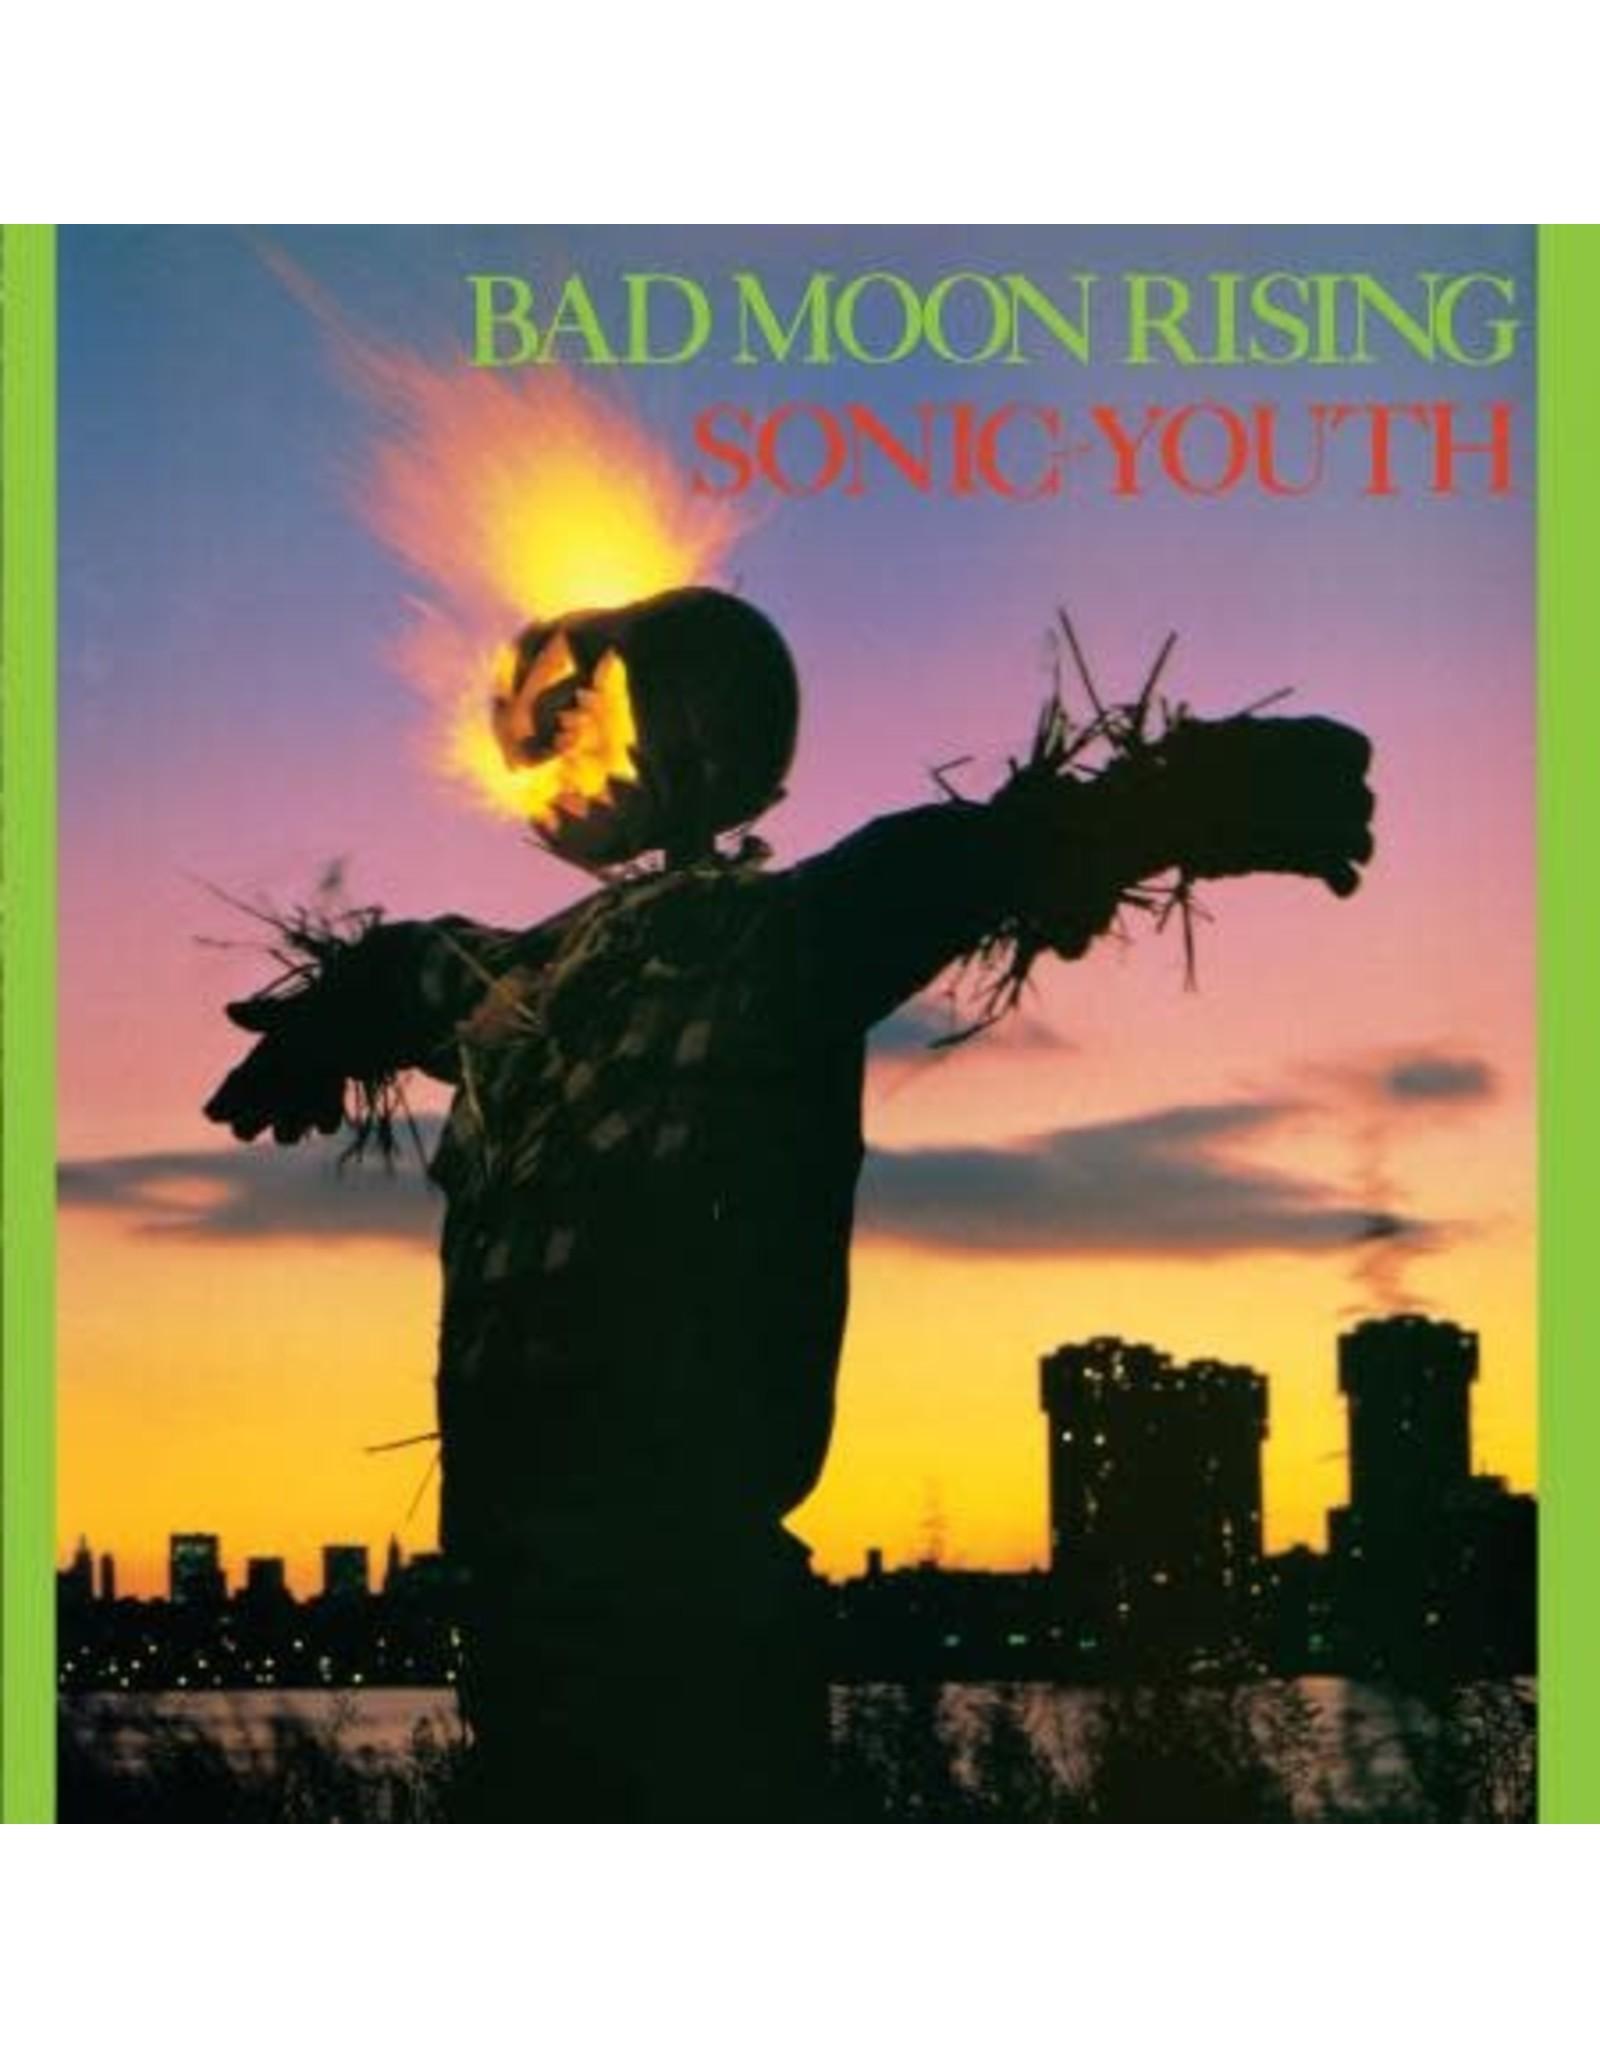 Goofin' Sonic Youth: Bad Moon Rising LP